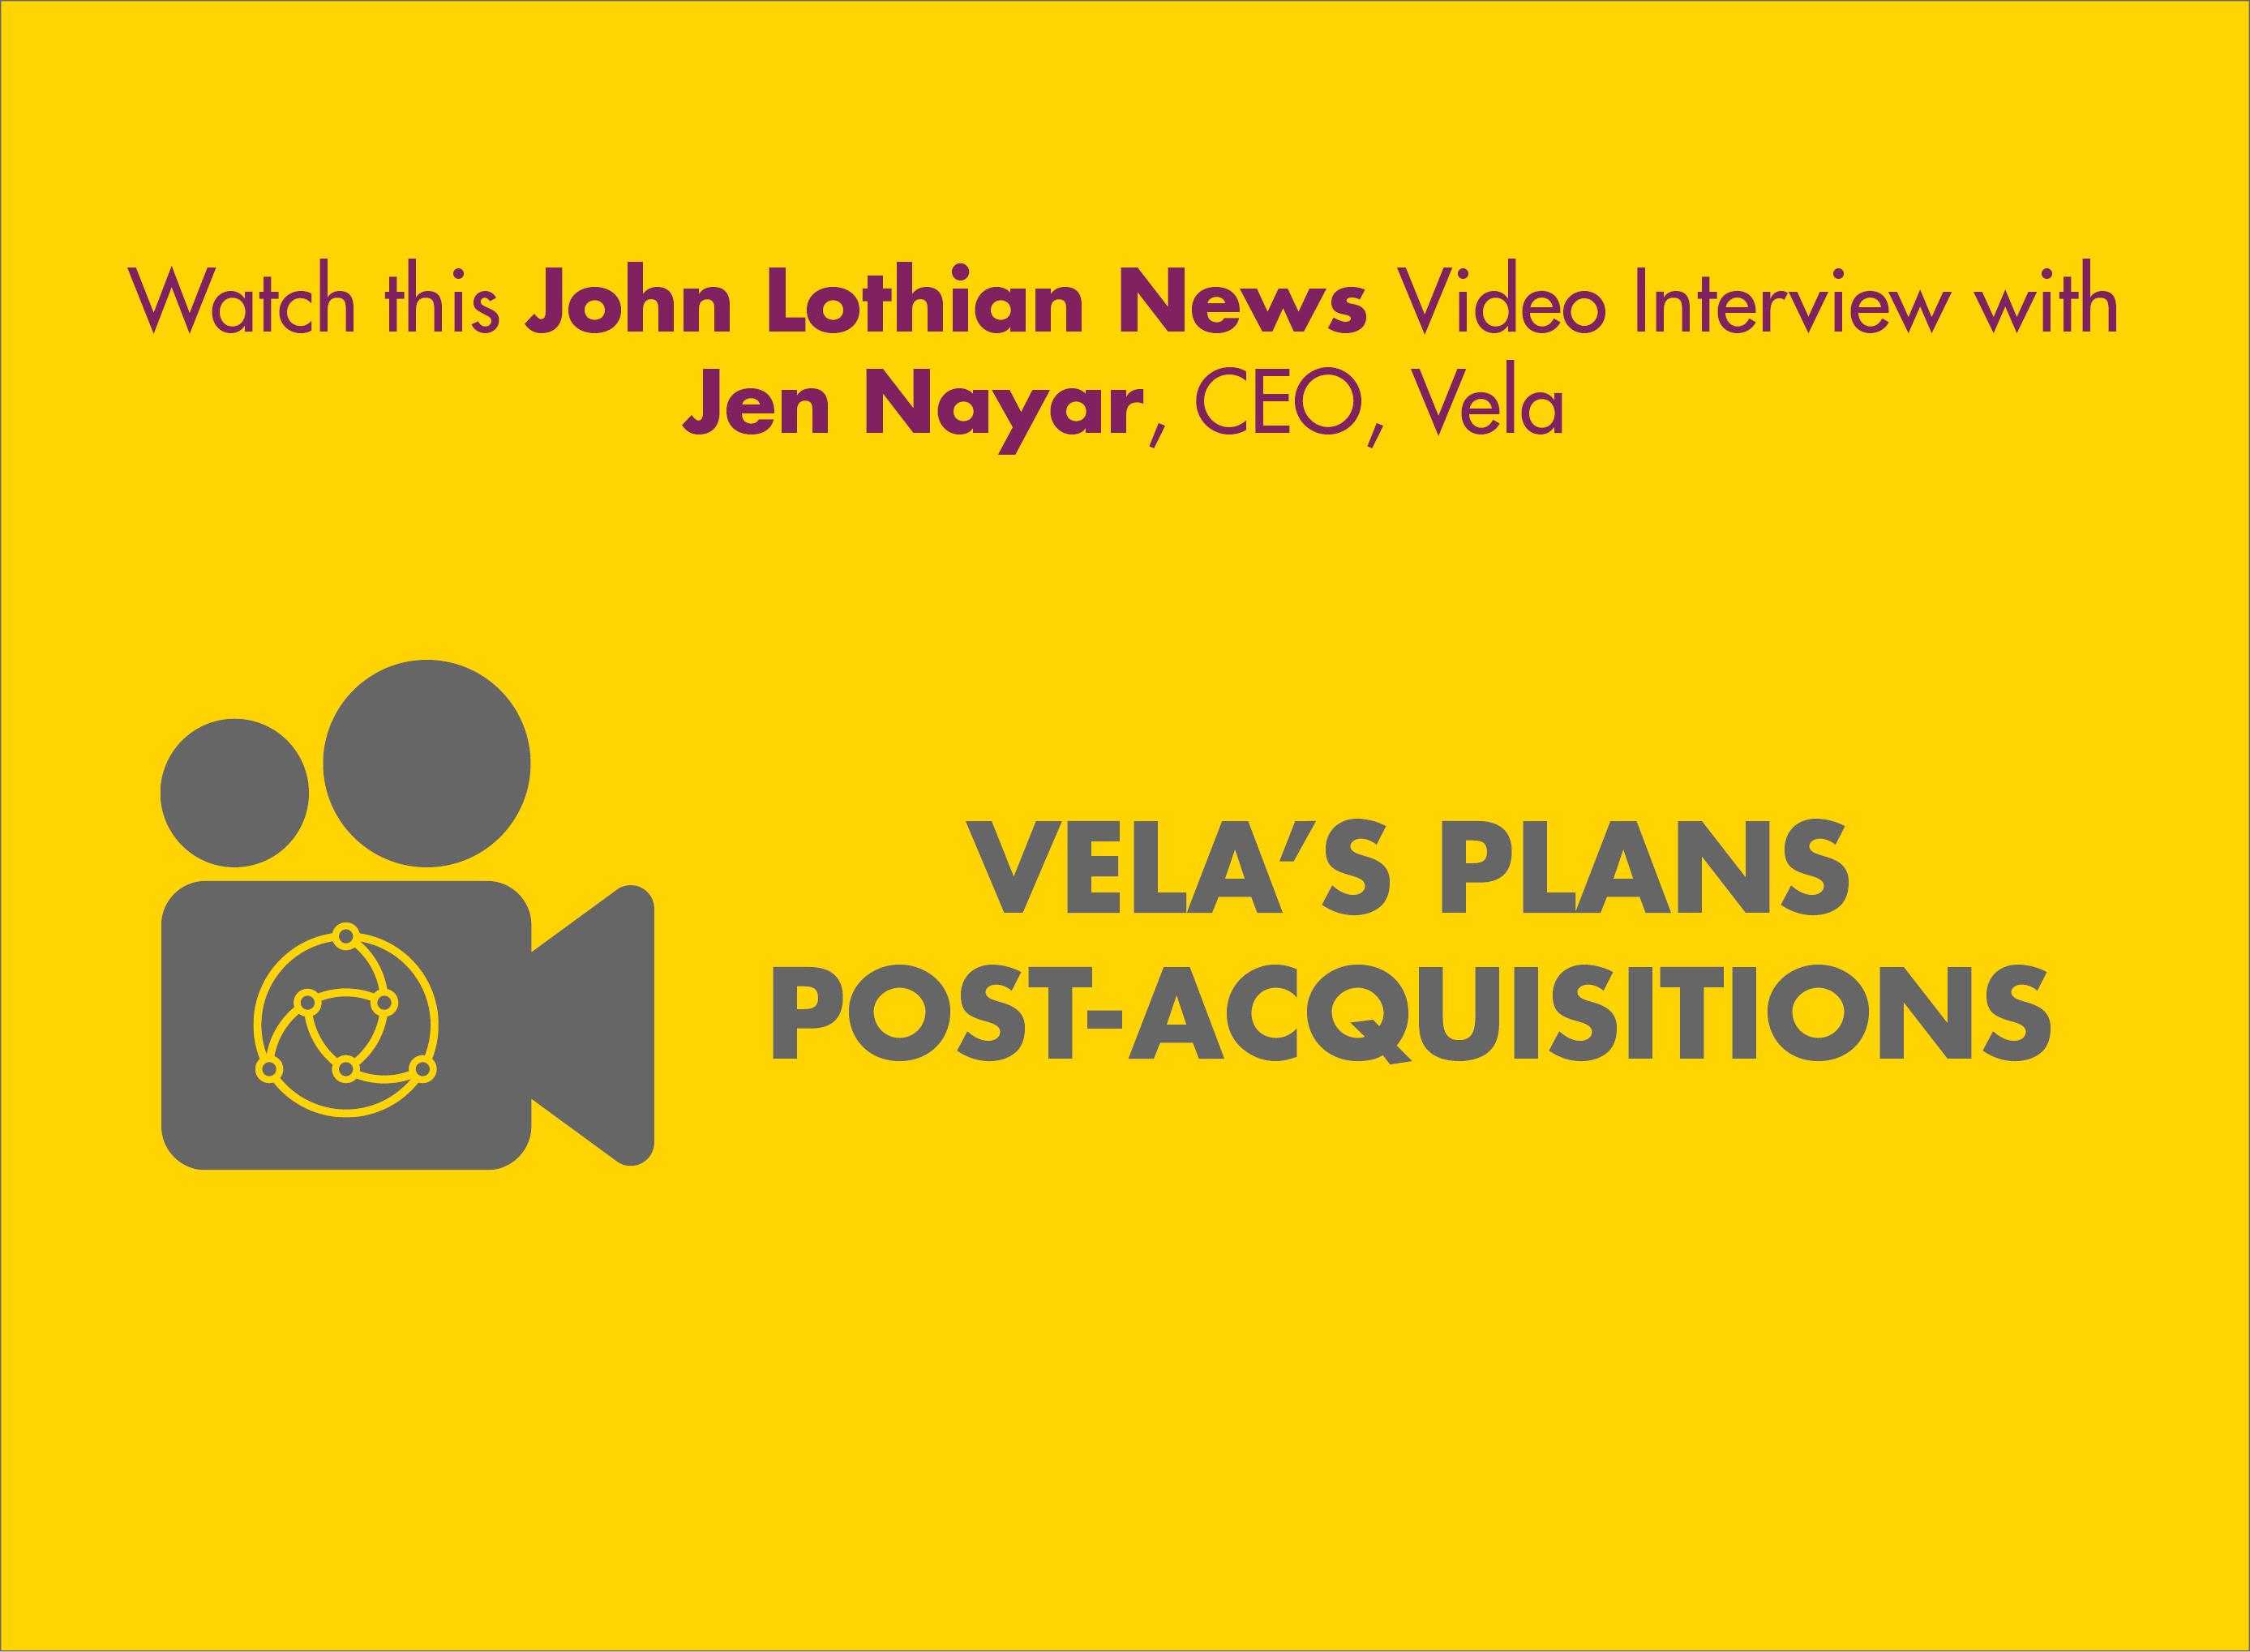 John Lothian News Video Interview with Jen Nayar